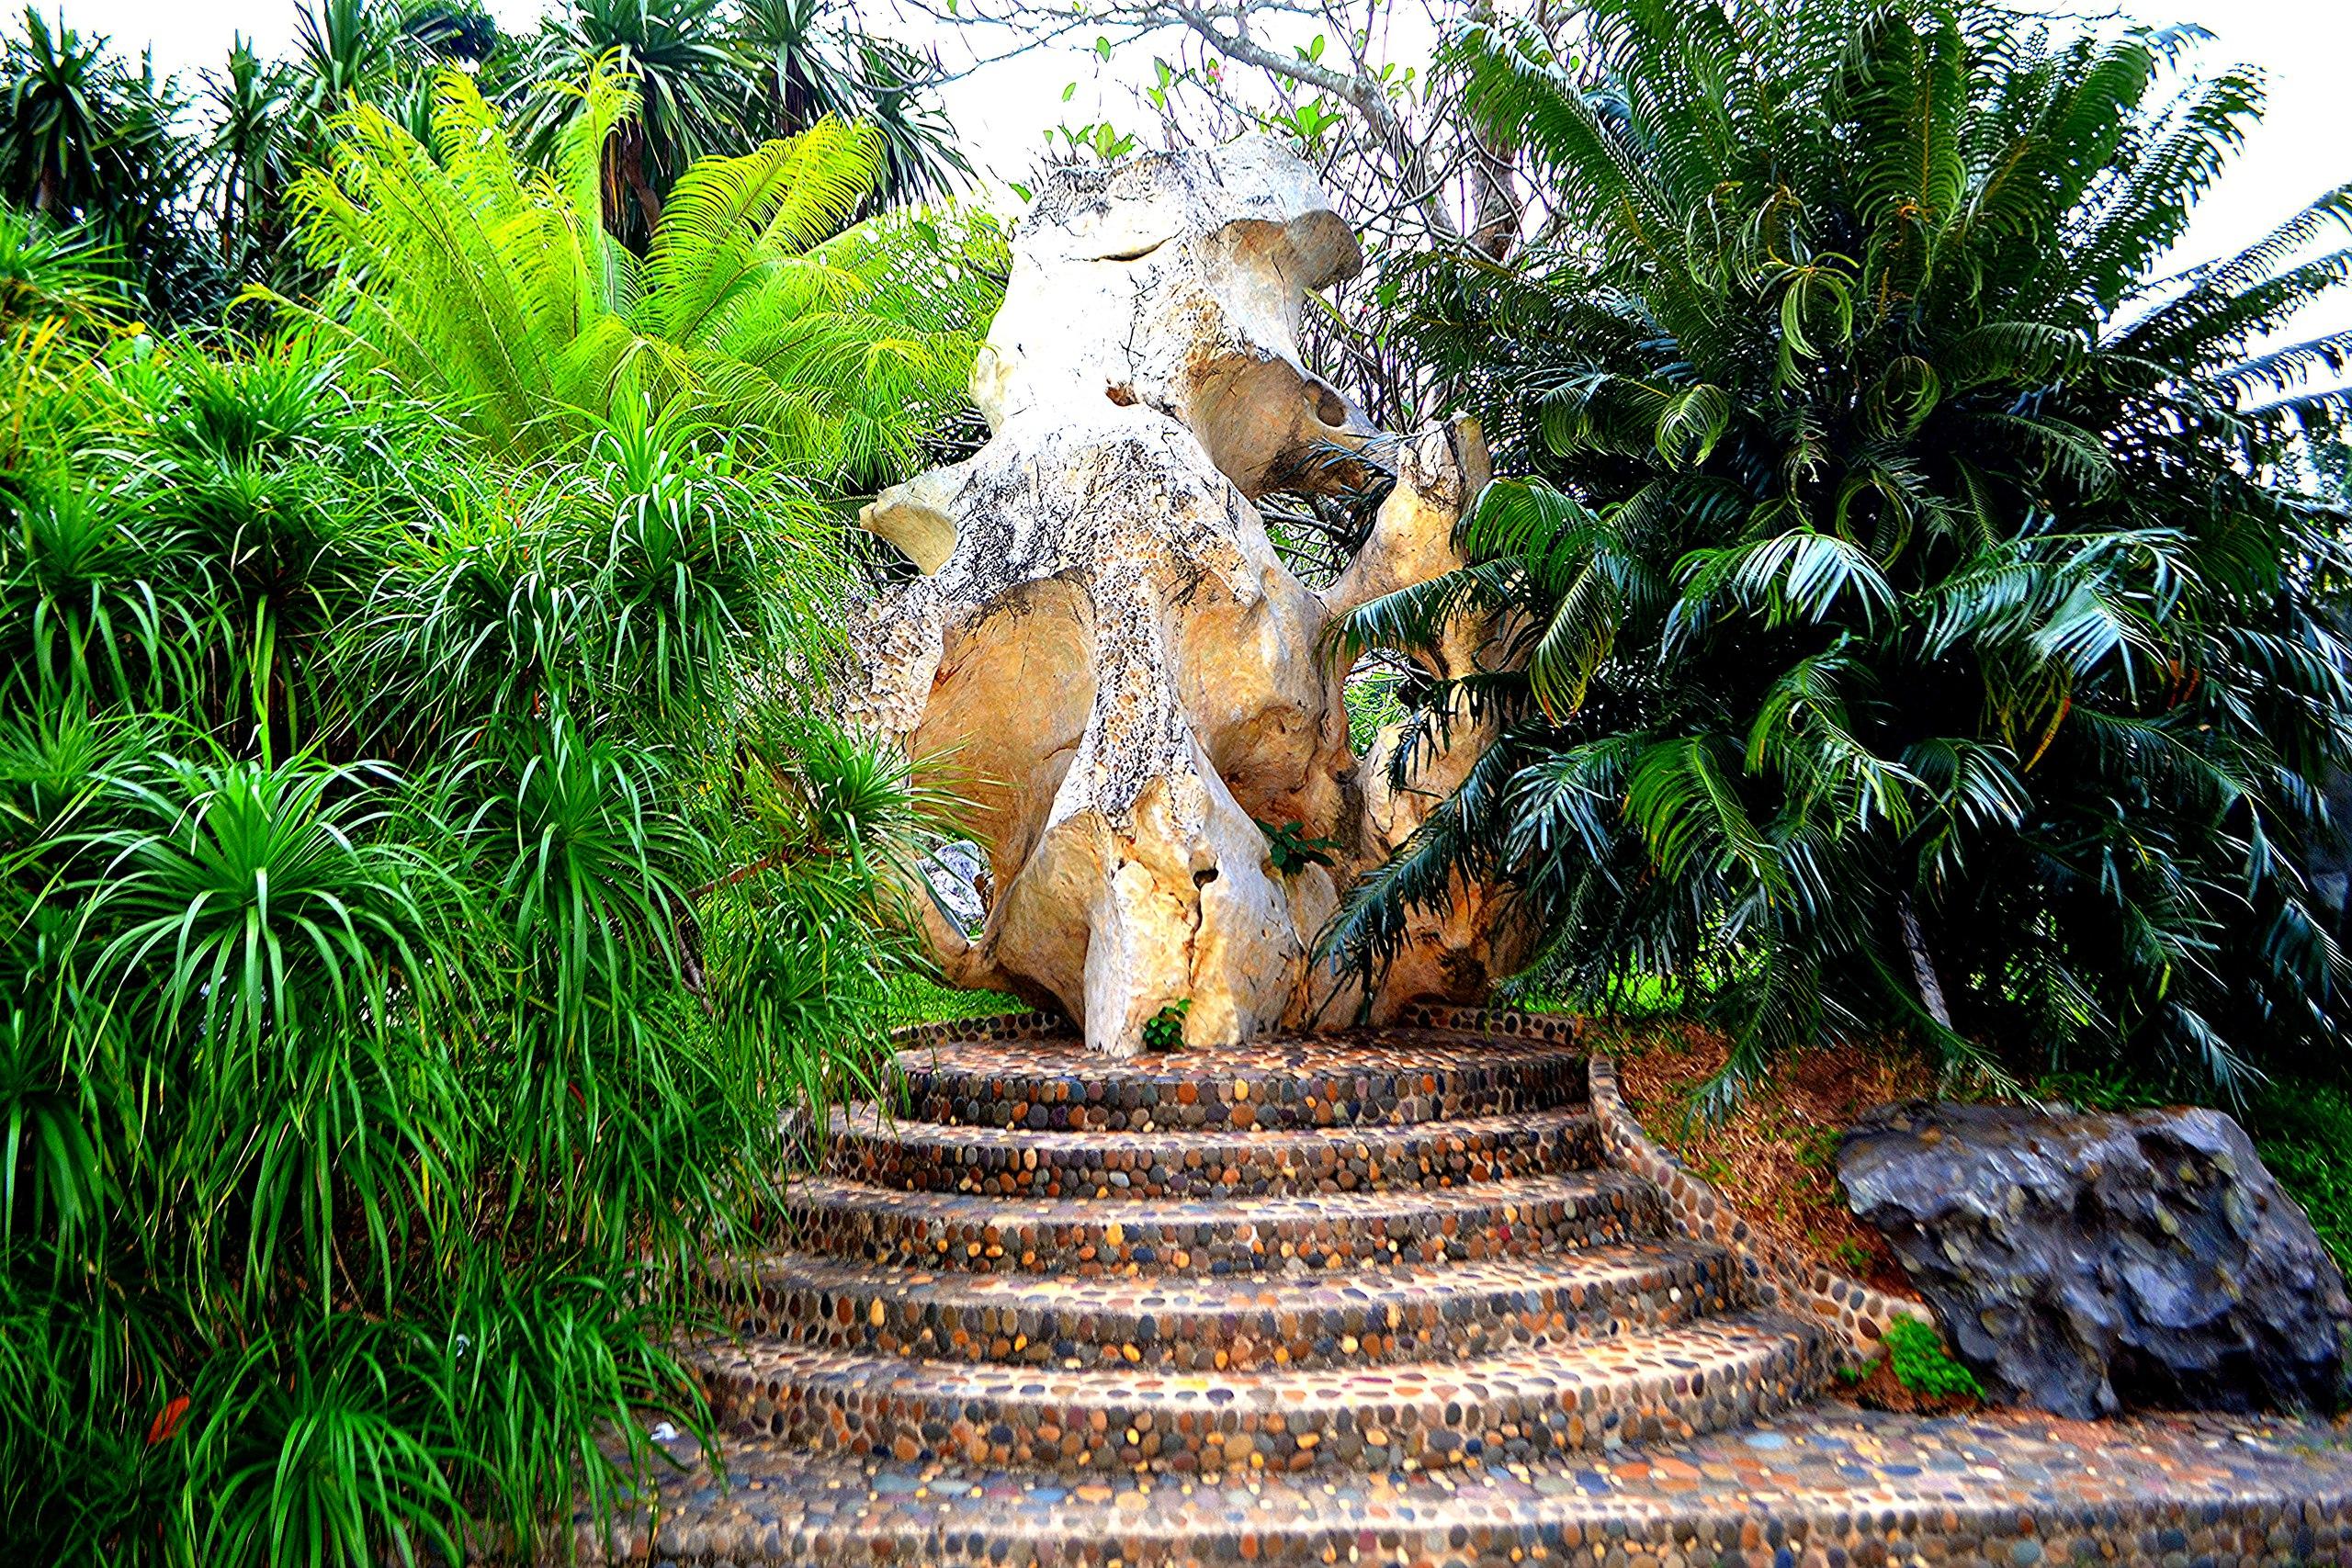 Елена Руденко ( Валтея ). Таиланд. Парк миллионолетних камней и крокодиловая ферма. FEYMWNPjq8s